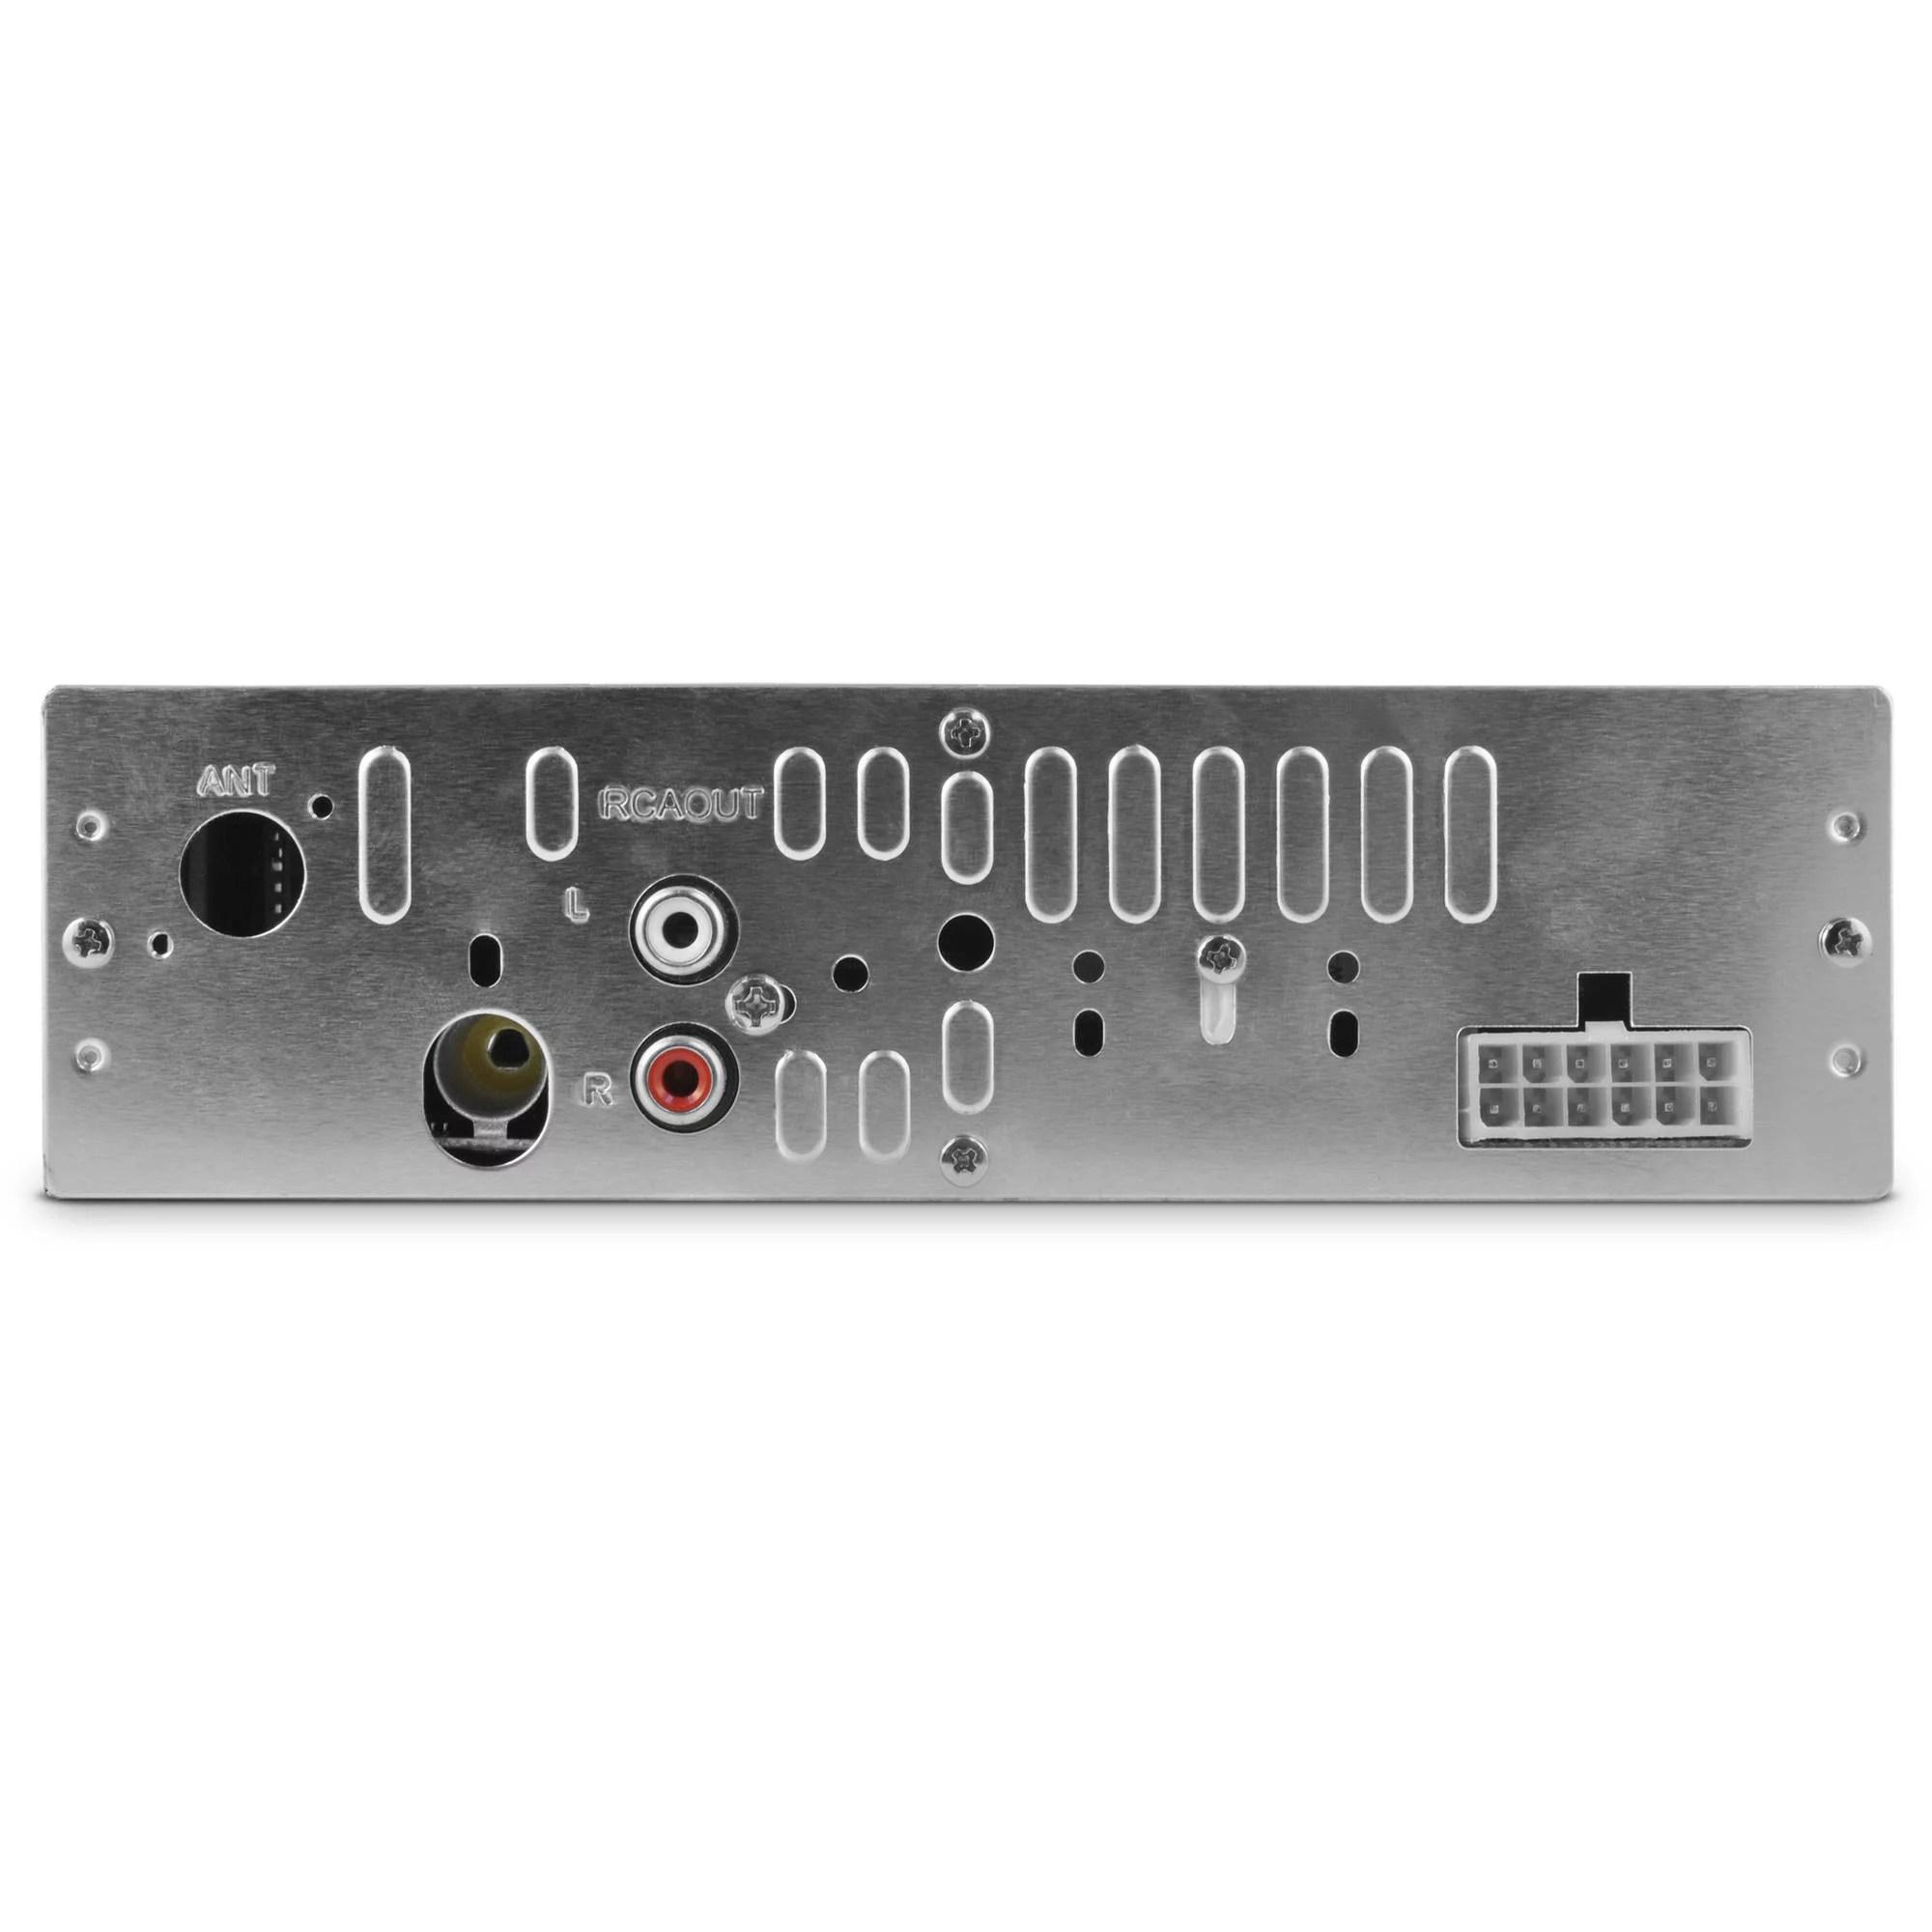 hight resolution of 2398cffb 1e22 47e1 8f42 3716820e20fc 1 9ffc1f4cd05eb4b20758e14bb3f5ddd2 xo vision xd107bt car stereo mp3 fm receiver with